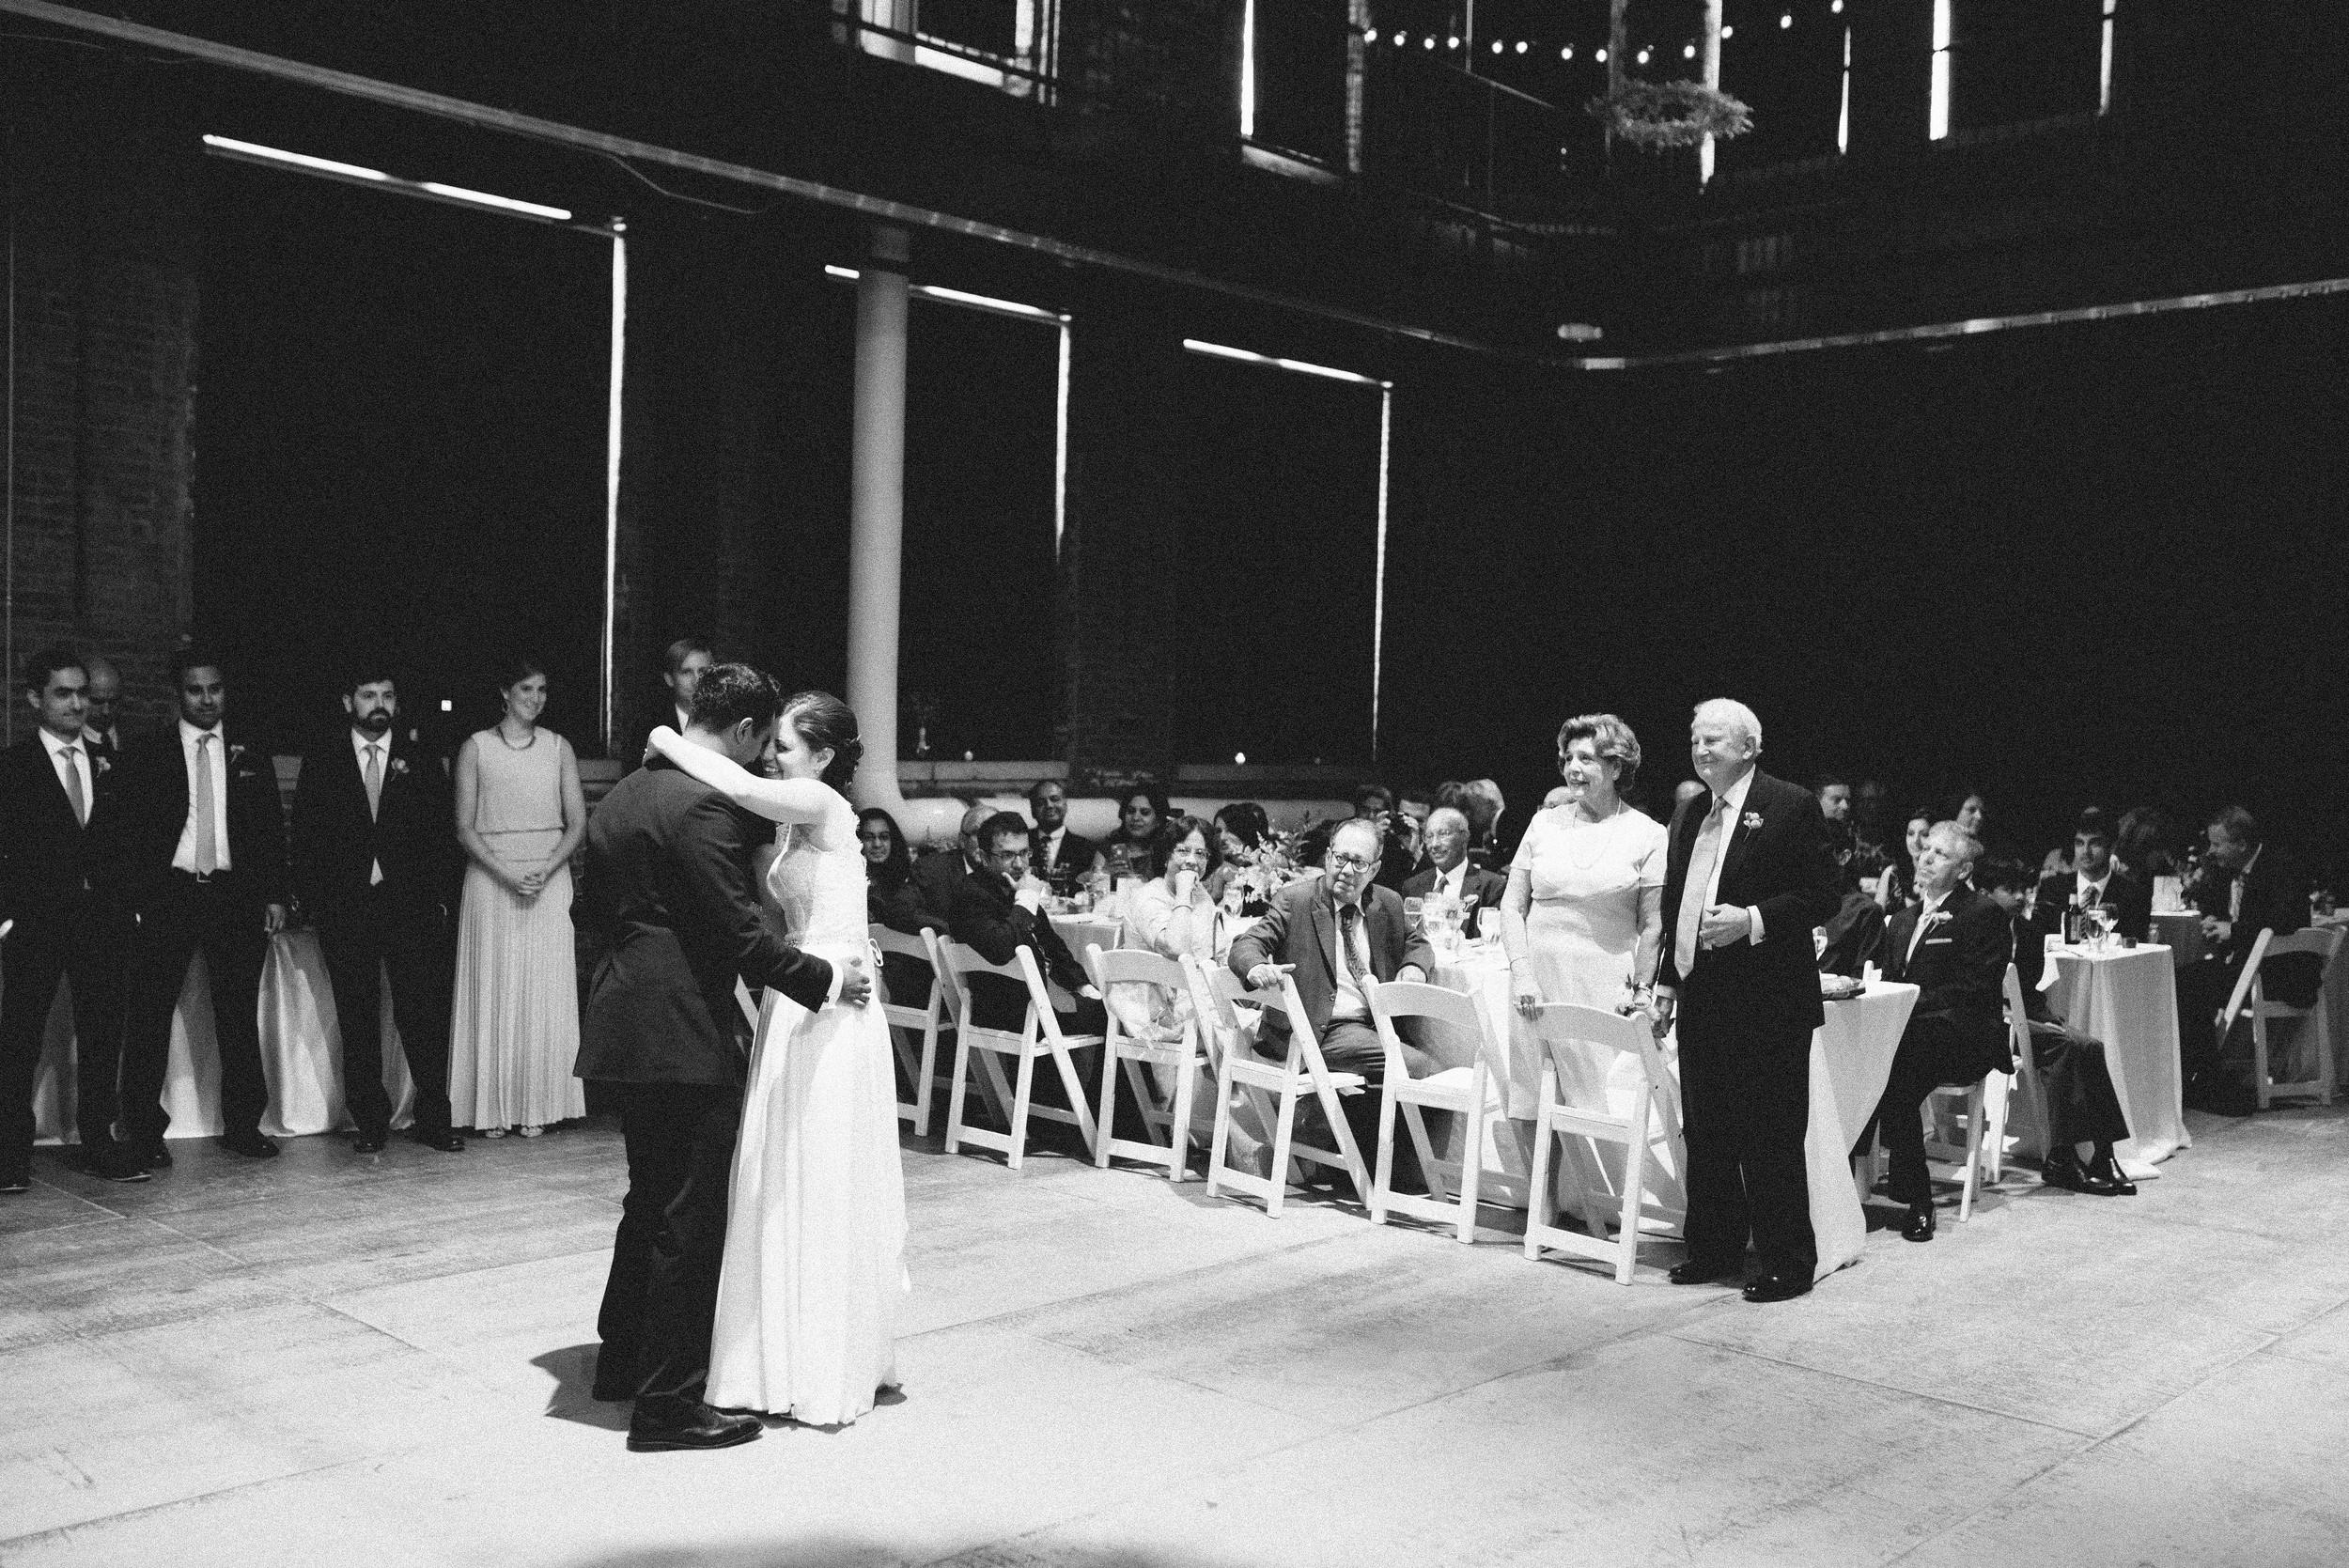 pittsburgh opera house wedding first dance.jpg